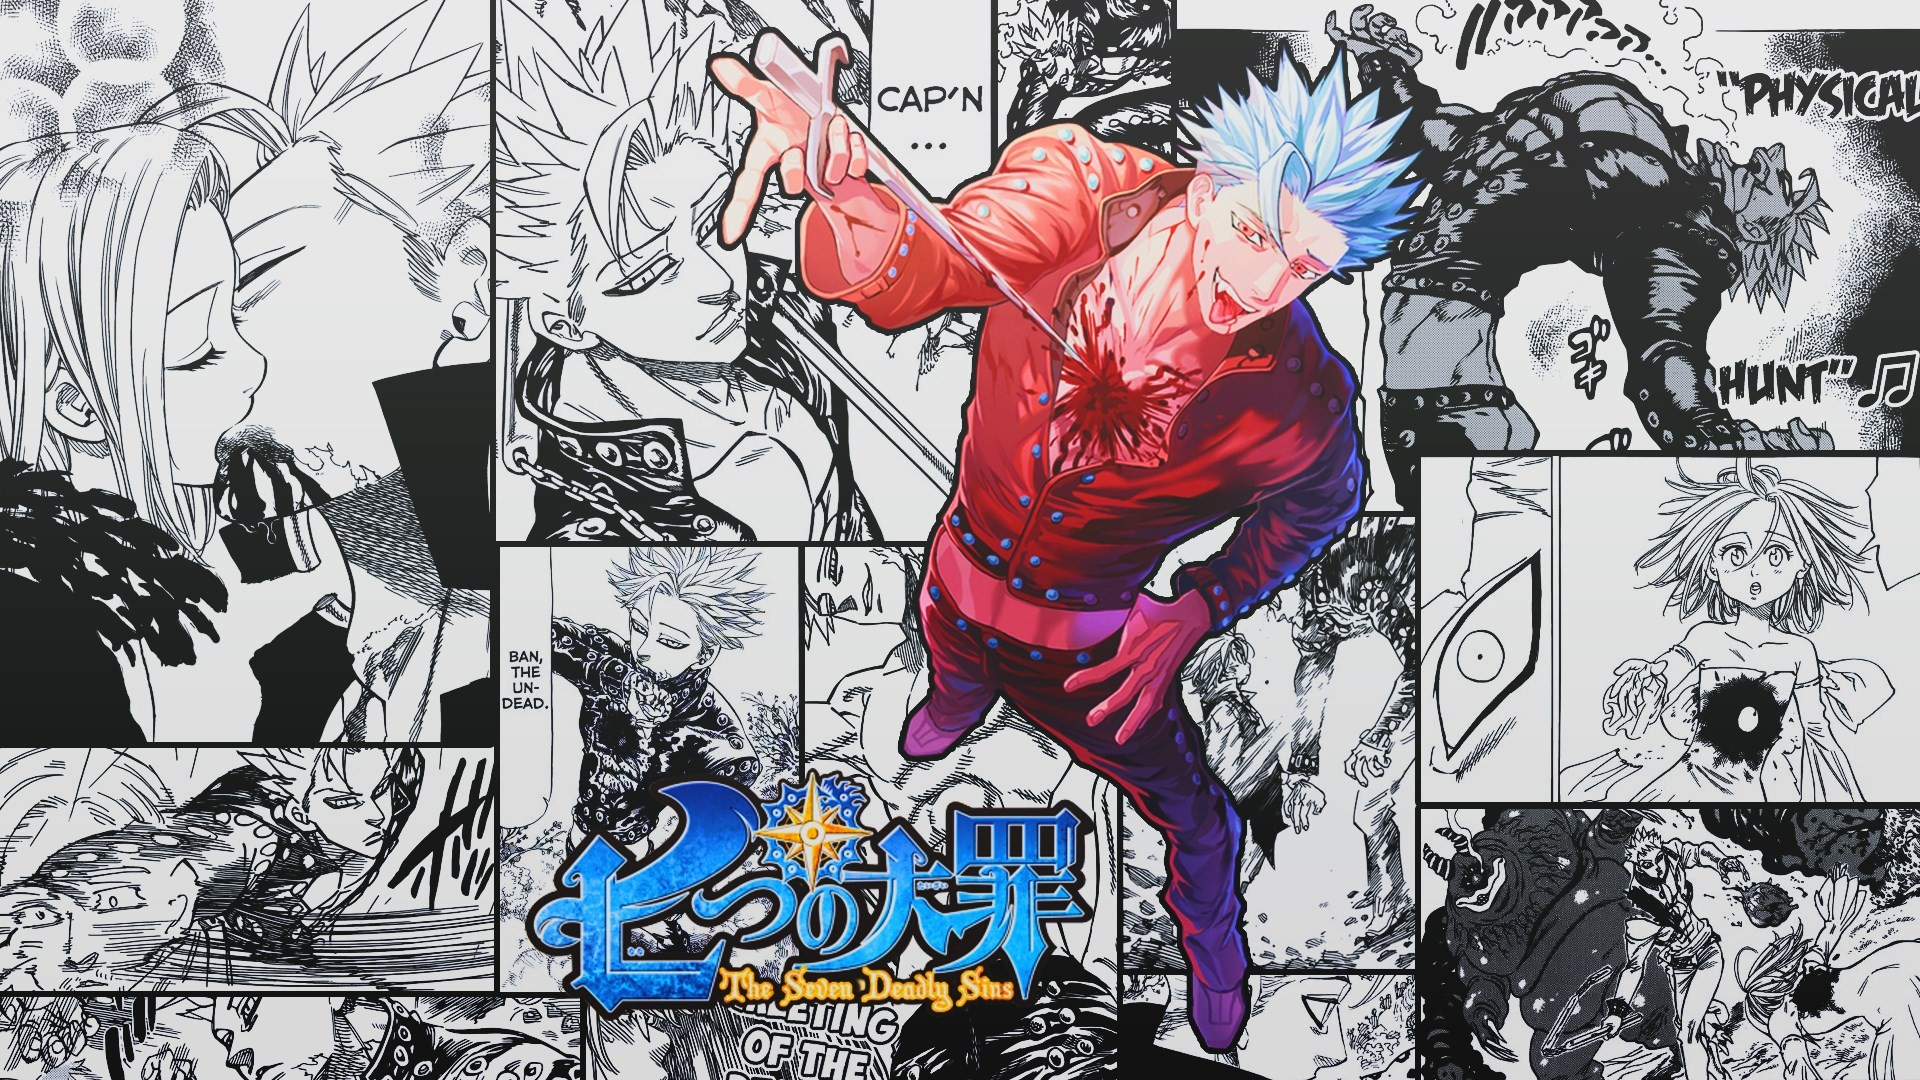 #1592488, Cool the seven deadly sins wallpaper